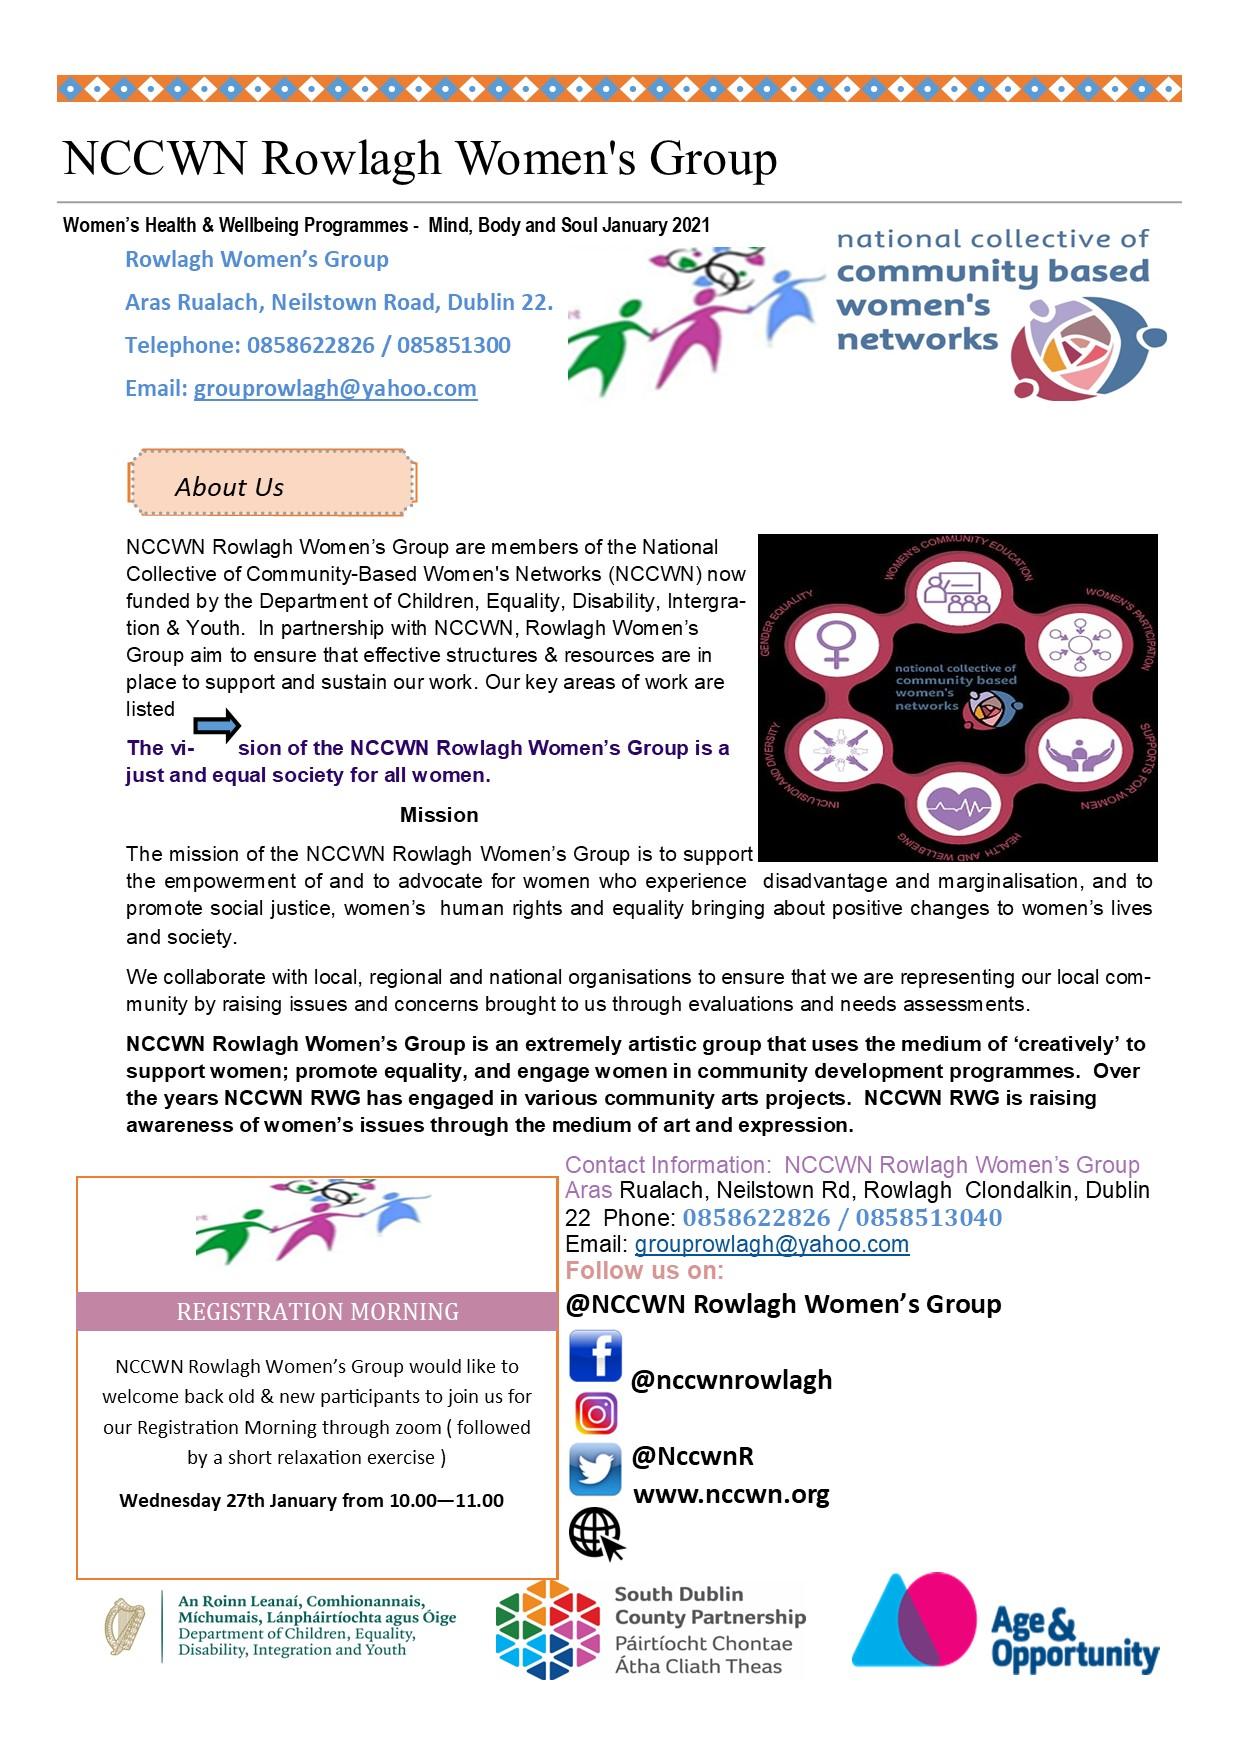 NCCWN Rowlagh Leaflet Page 2